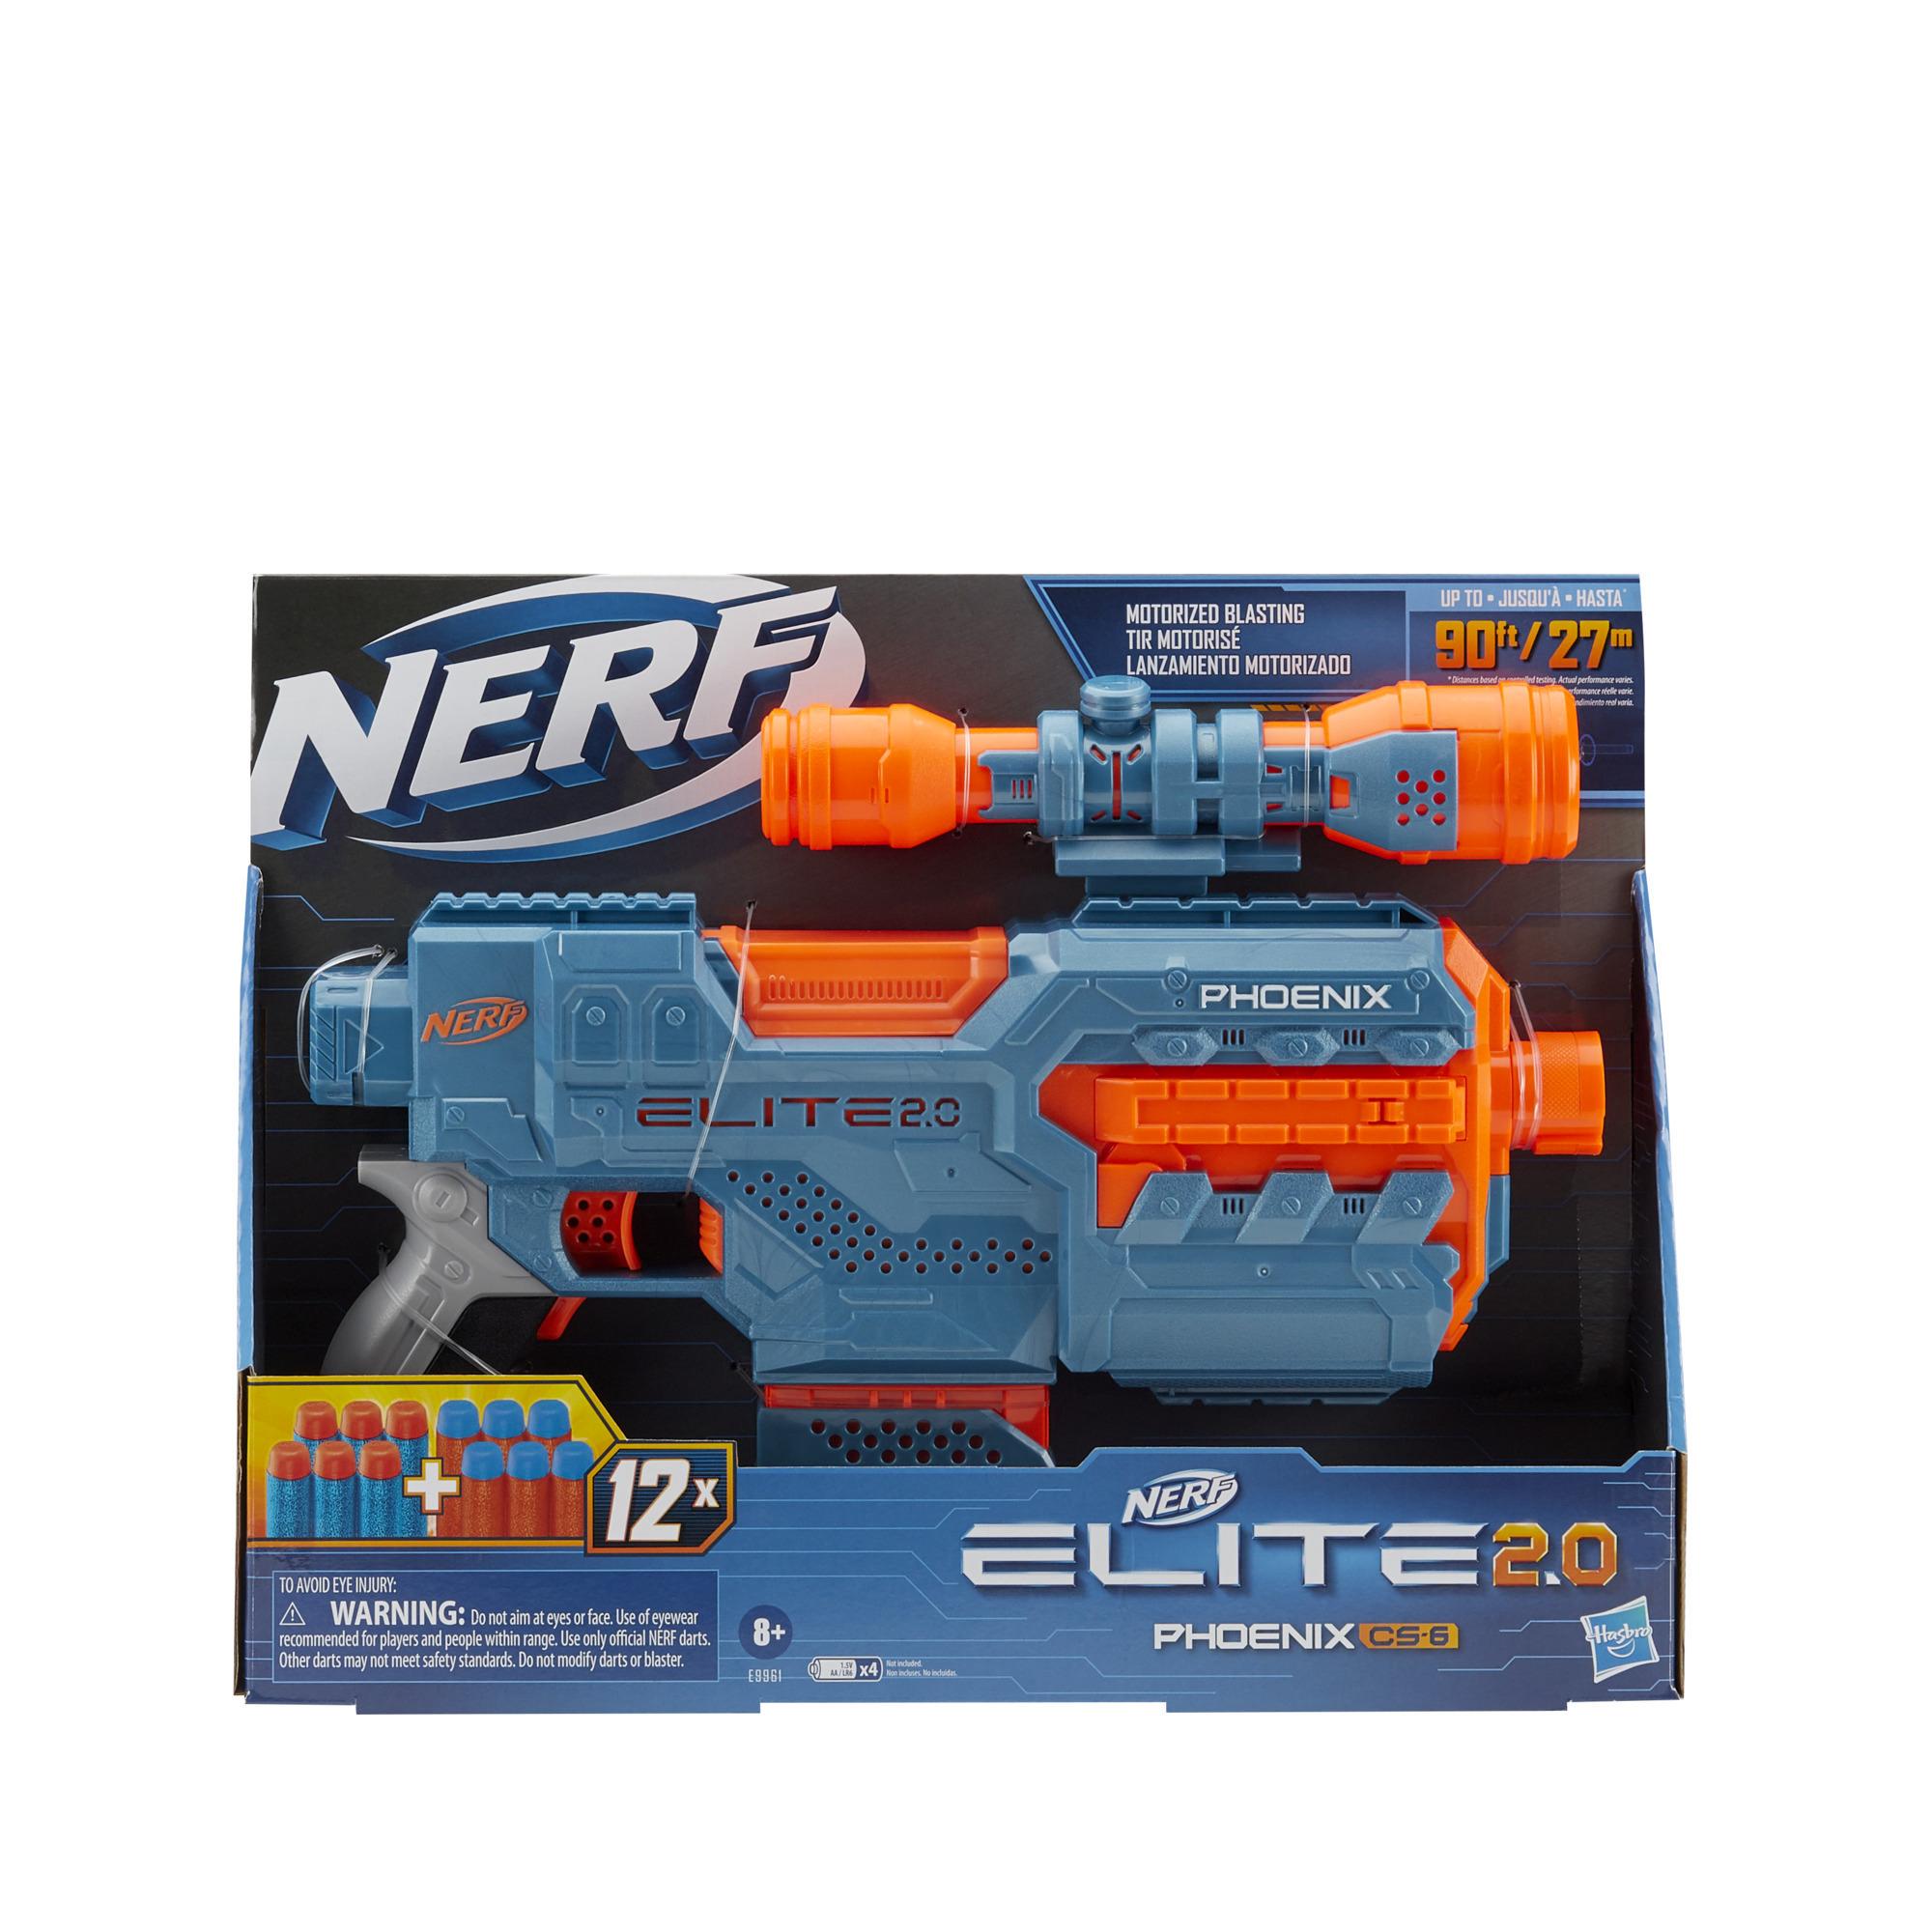 Blaster motorizat Nerf Elite 2.0 Phoenix CS-6, 12 sageti oficiale Nerf, luneta, incarcator, optiuni de personalizare incorporate